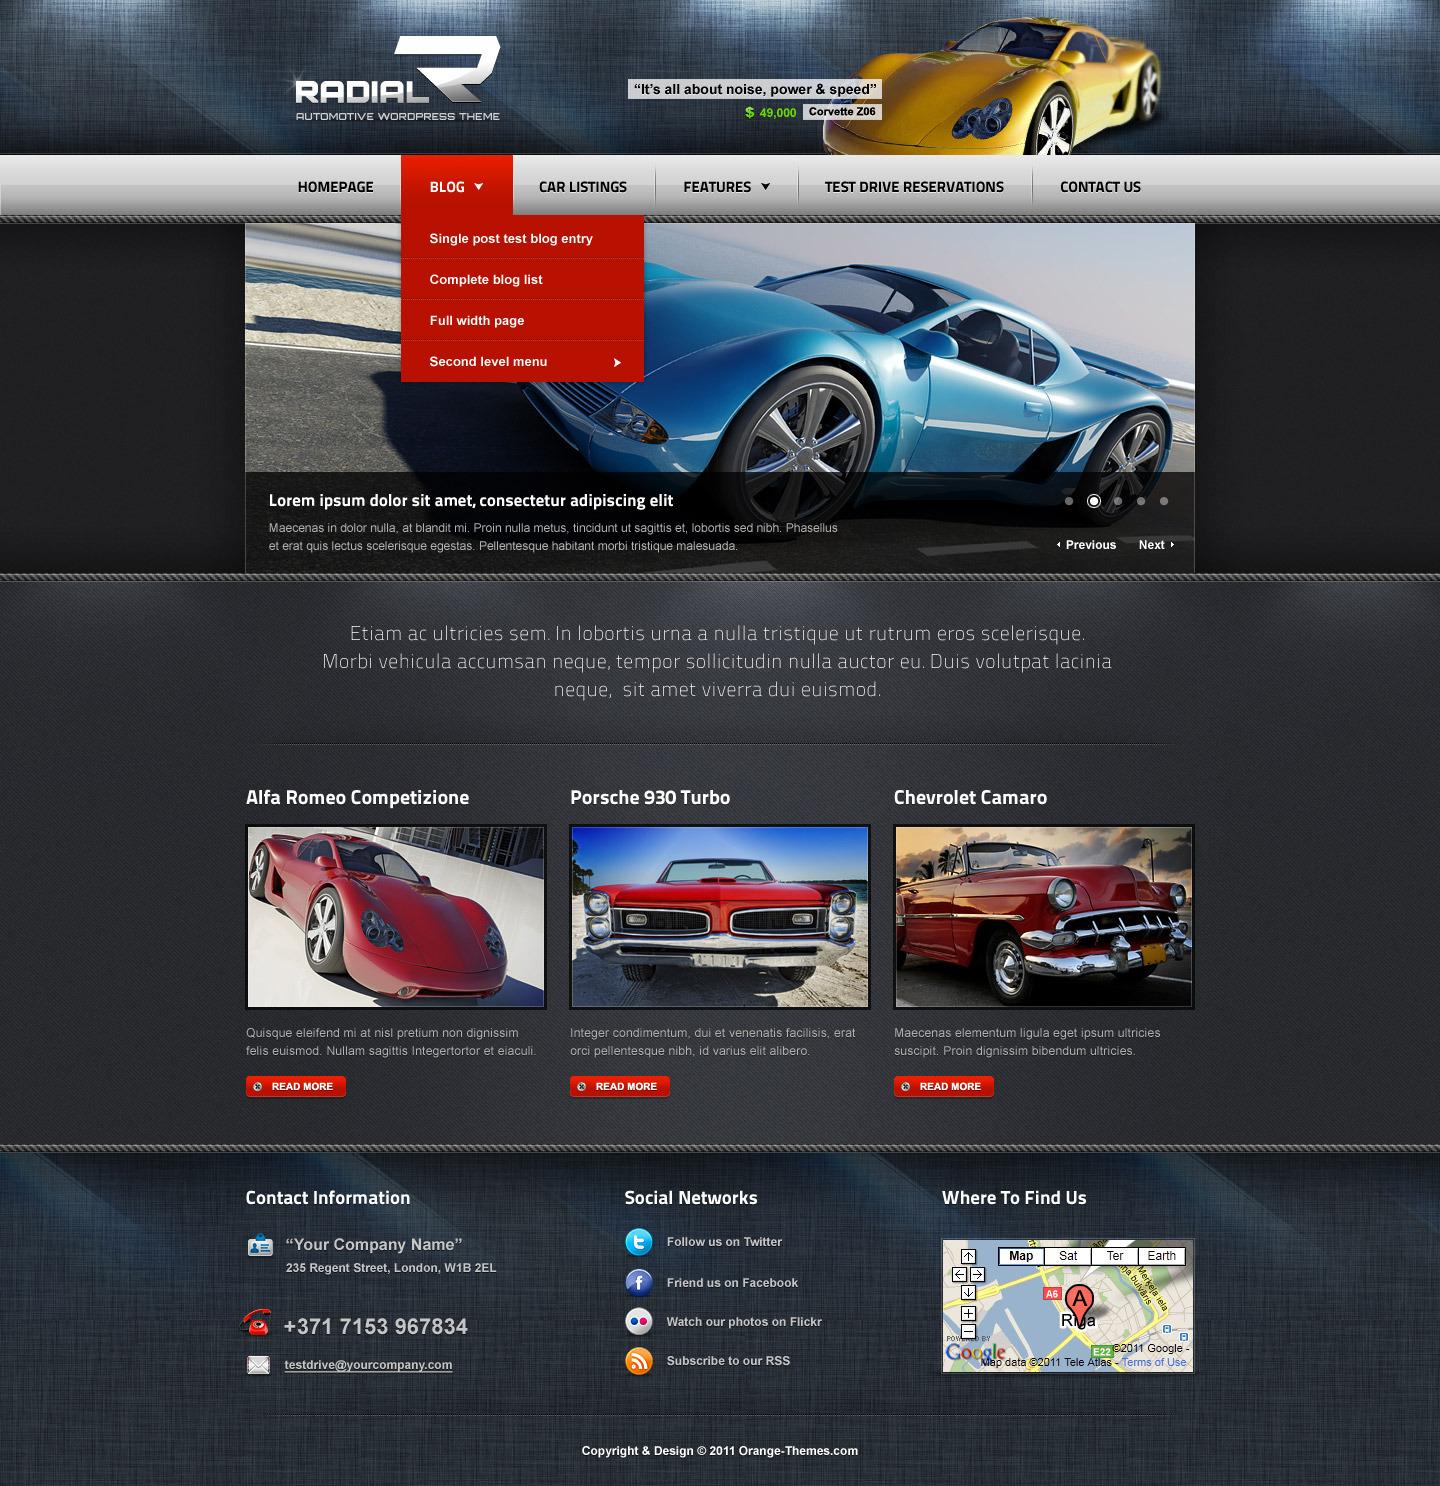 Radial - Premium Automotive & Tech HTML Template by orange-themes ...